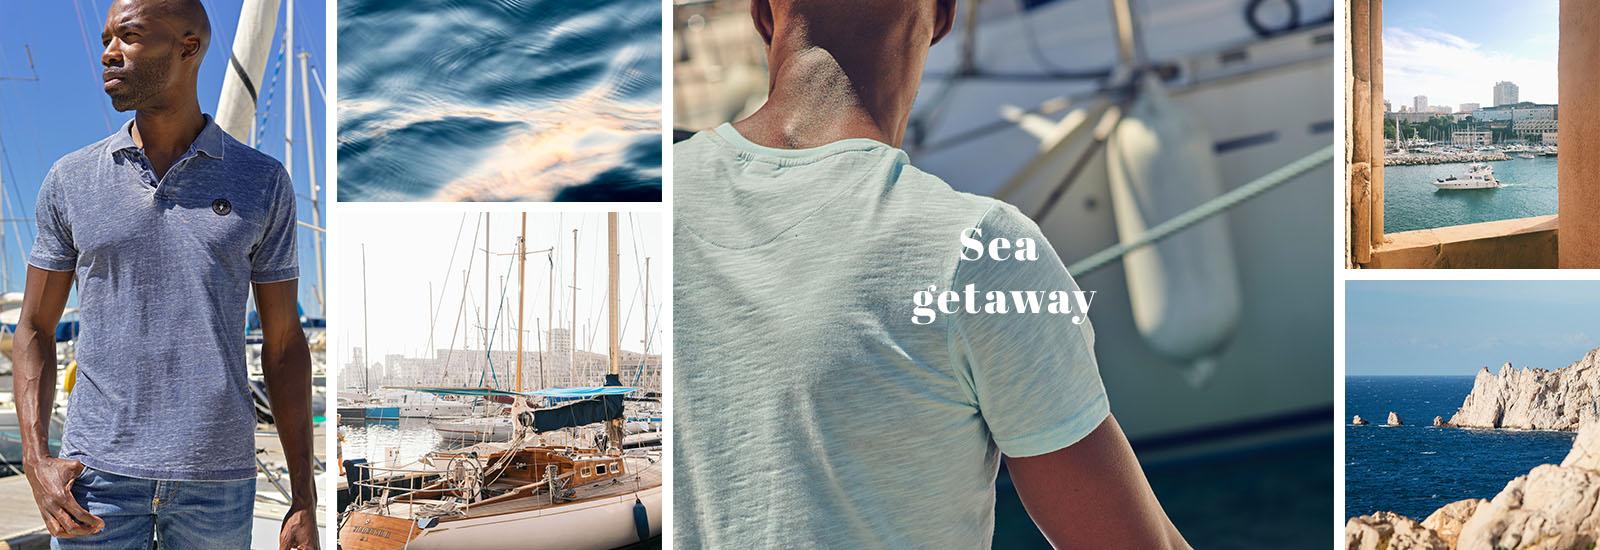 Sea getaway